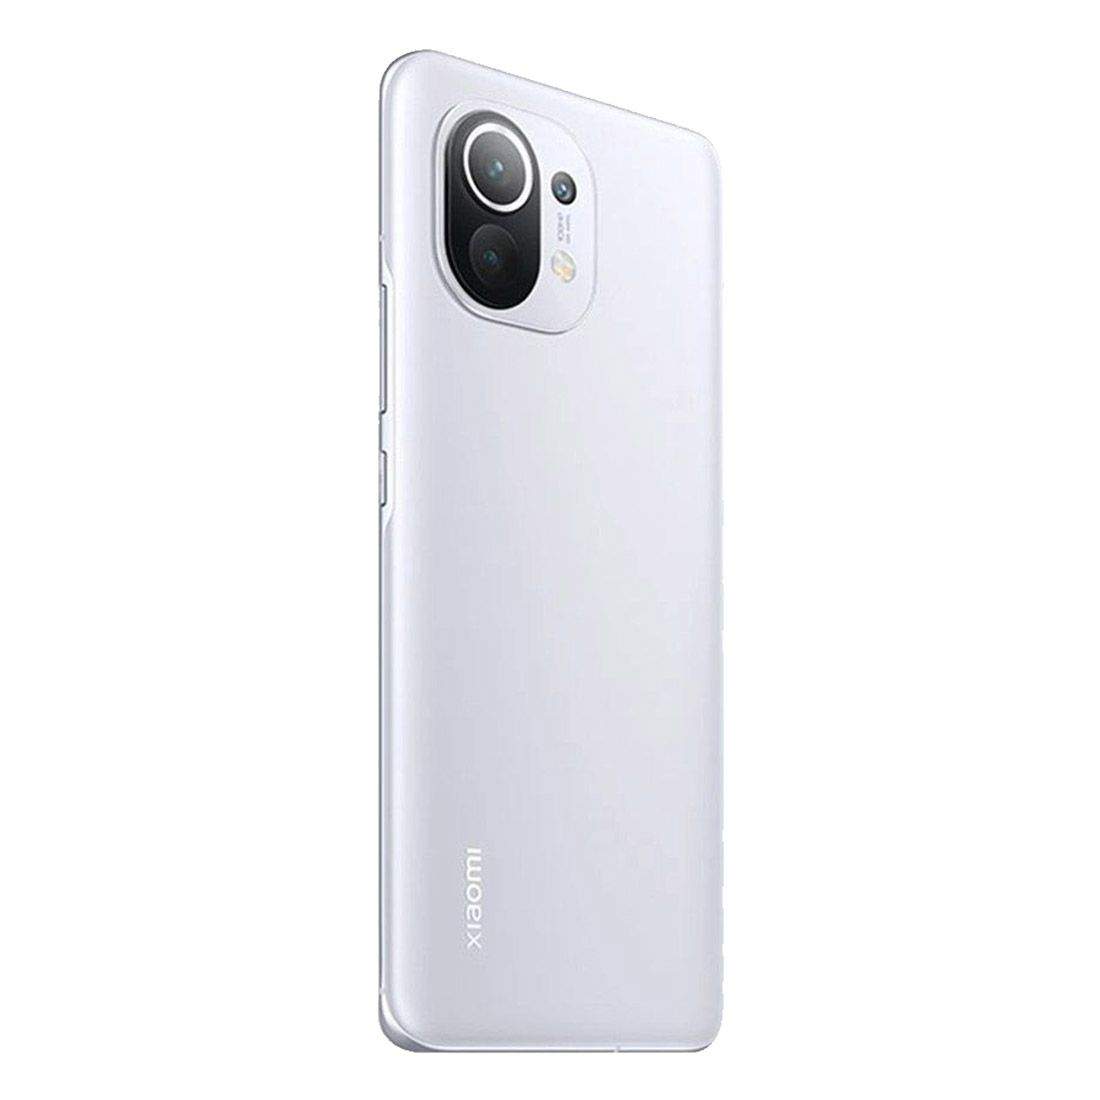 Xiaomi Mi 11 8 GB 128 GB Cep Telefonu Teknik Özellikleri